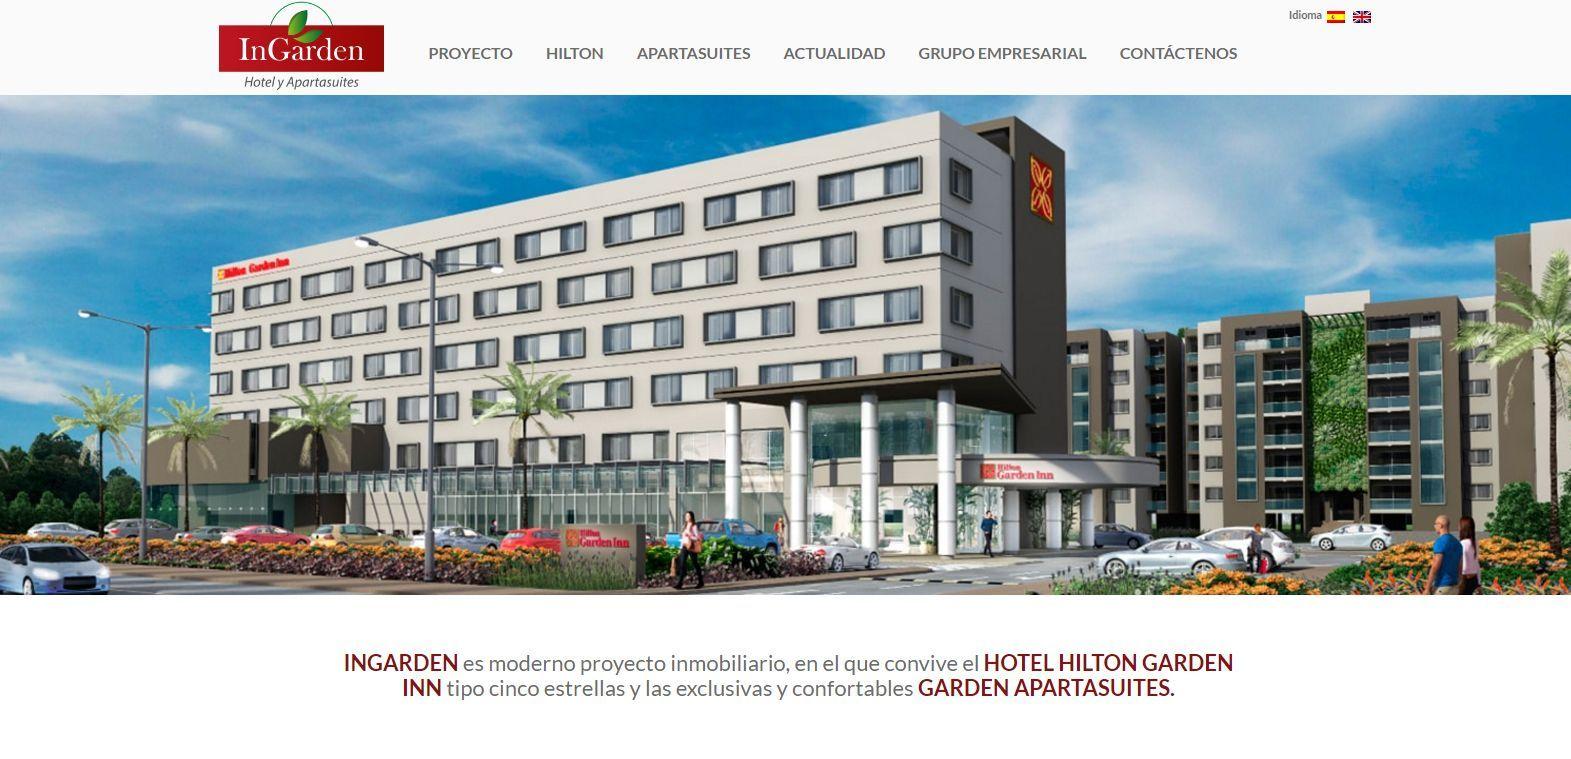 pagina-web-in-garden